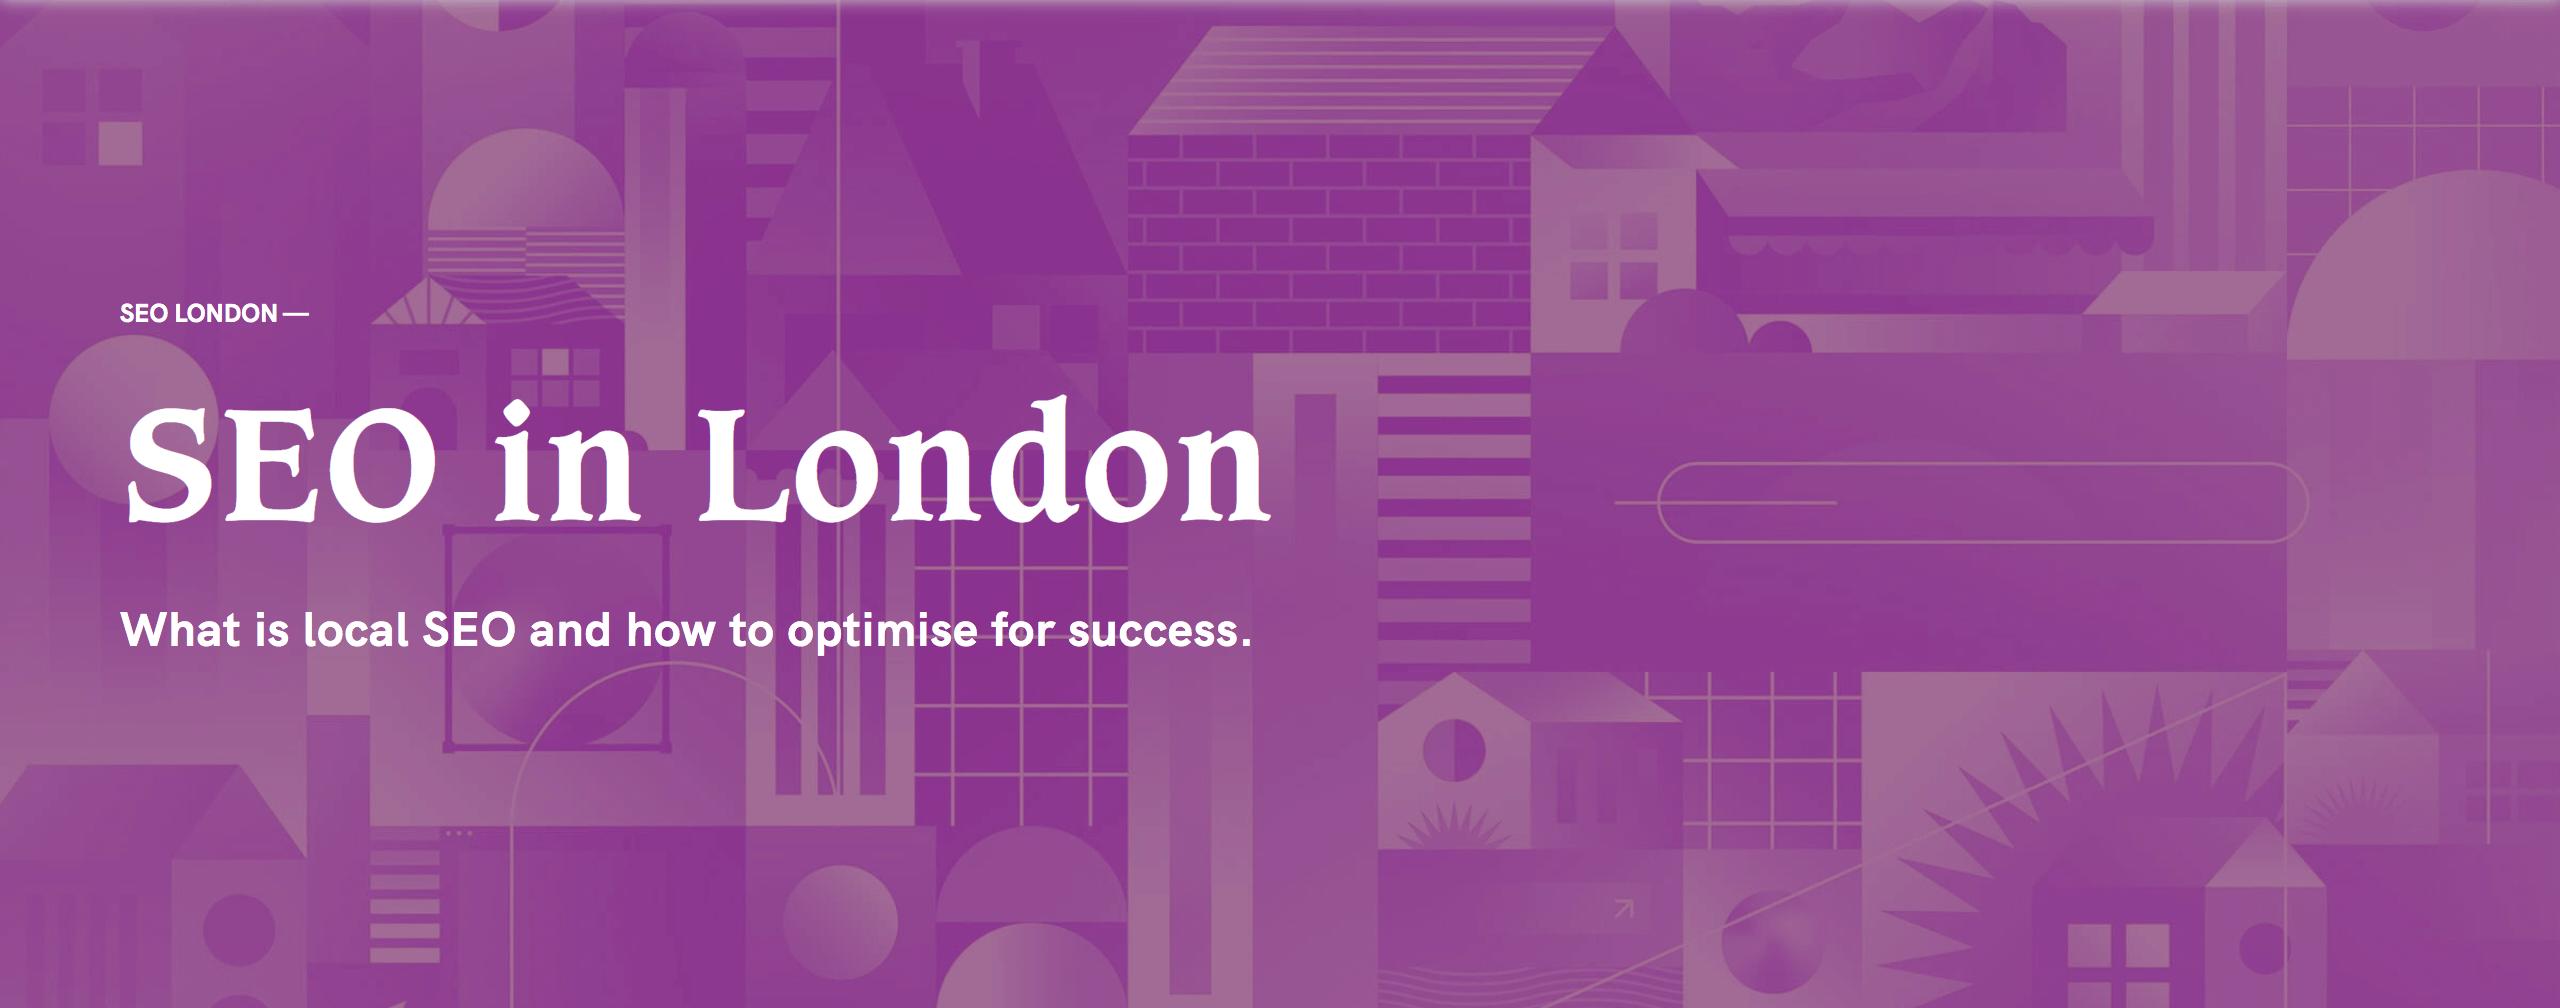 seo in london header